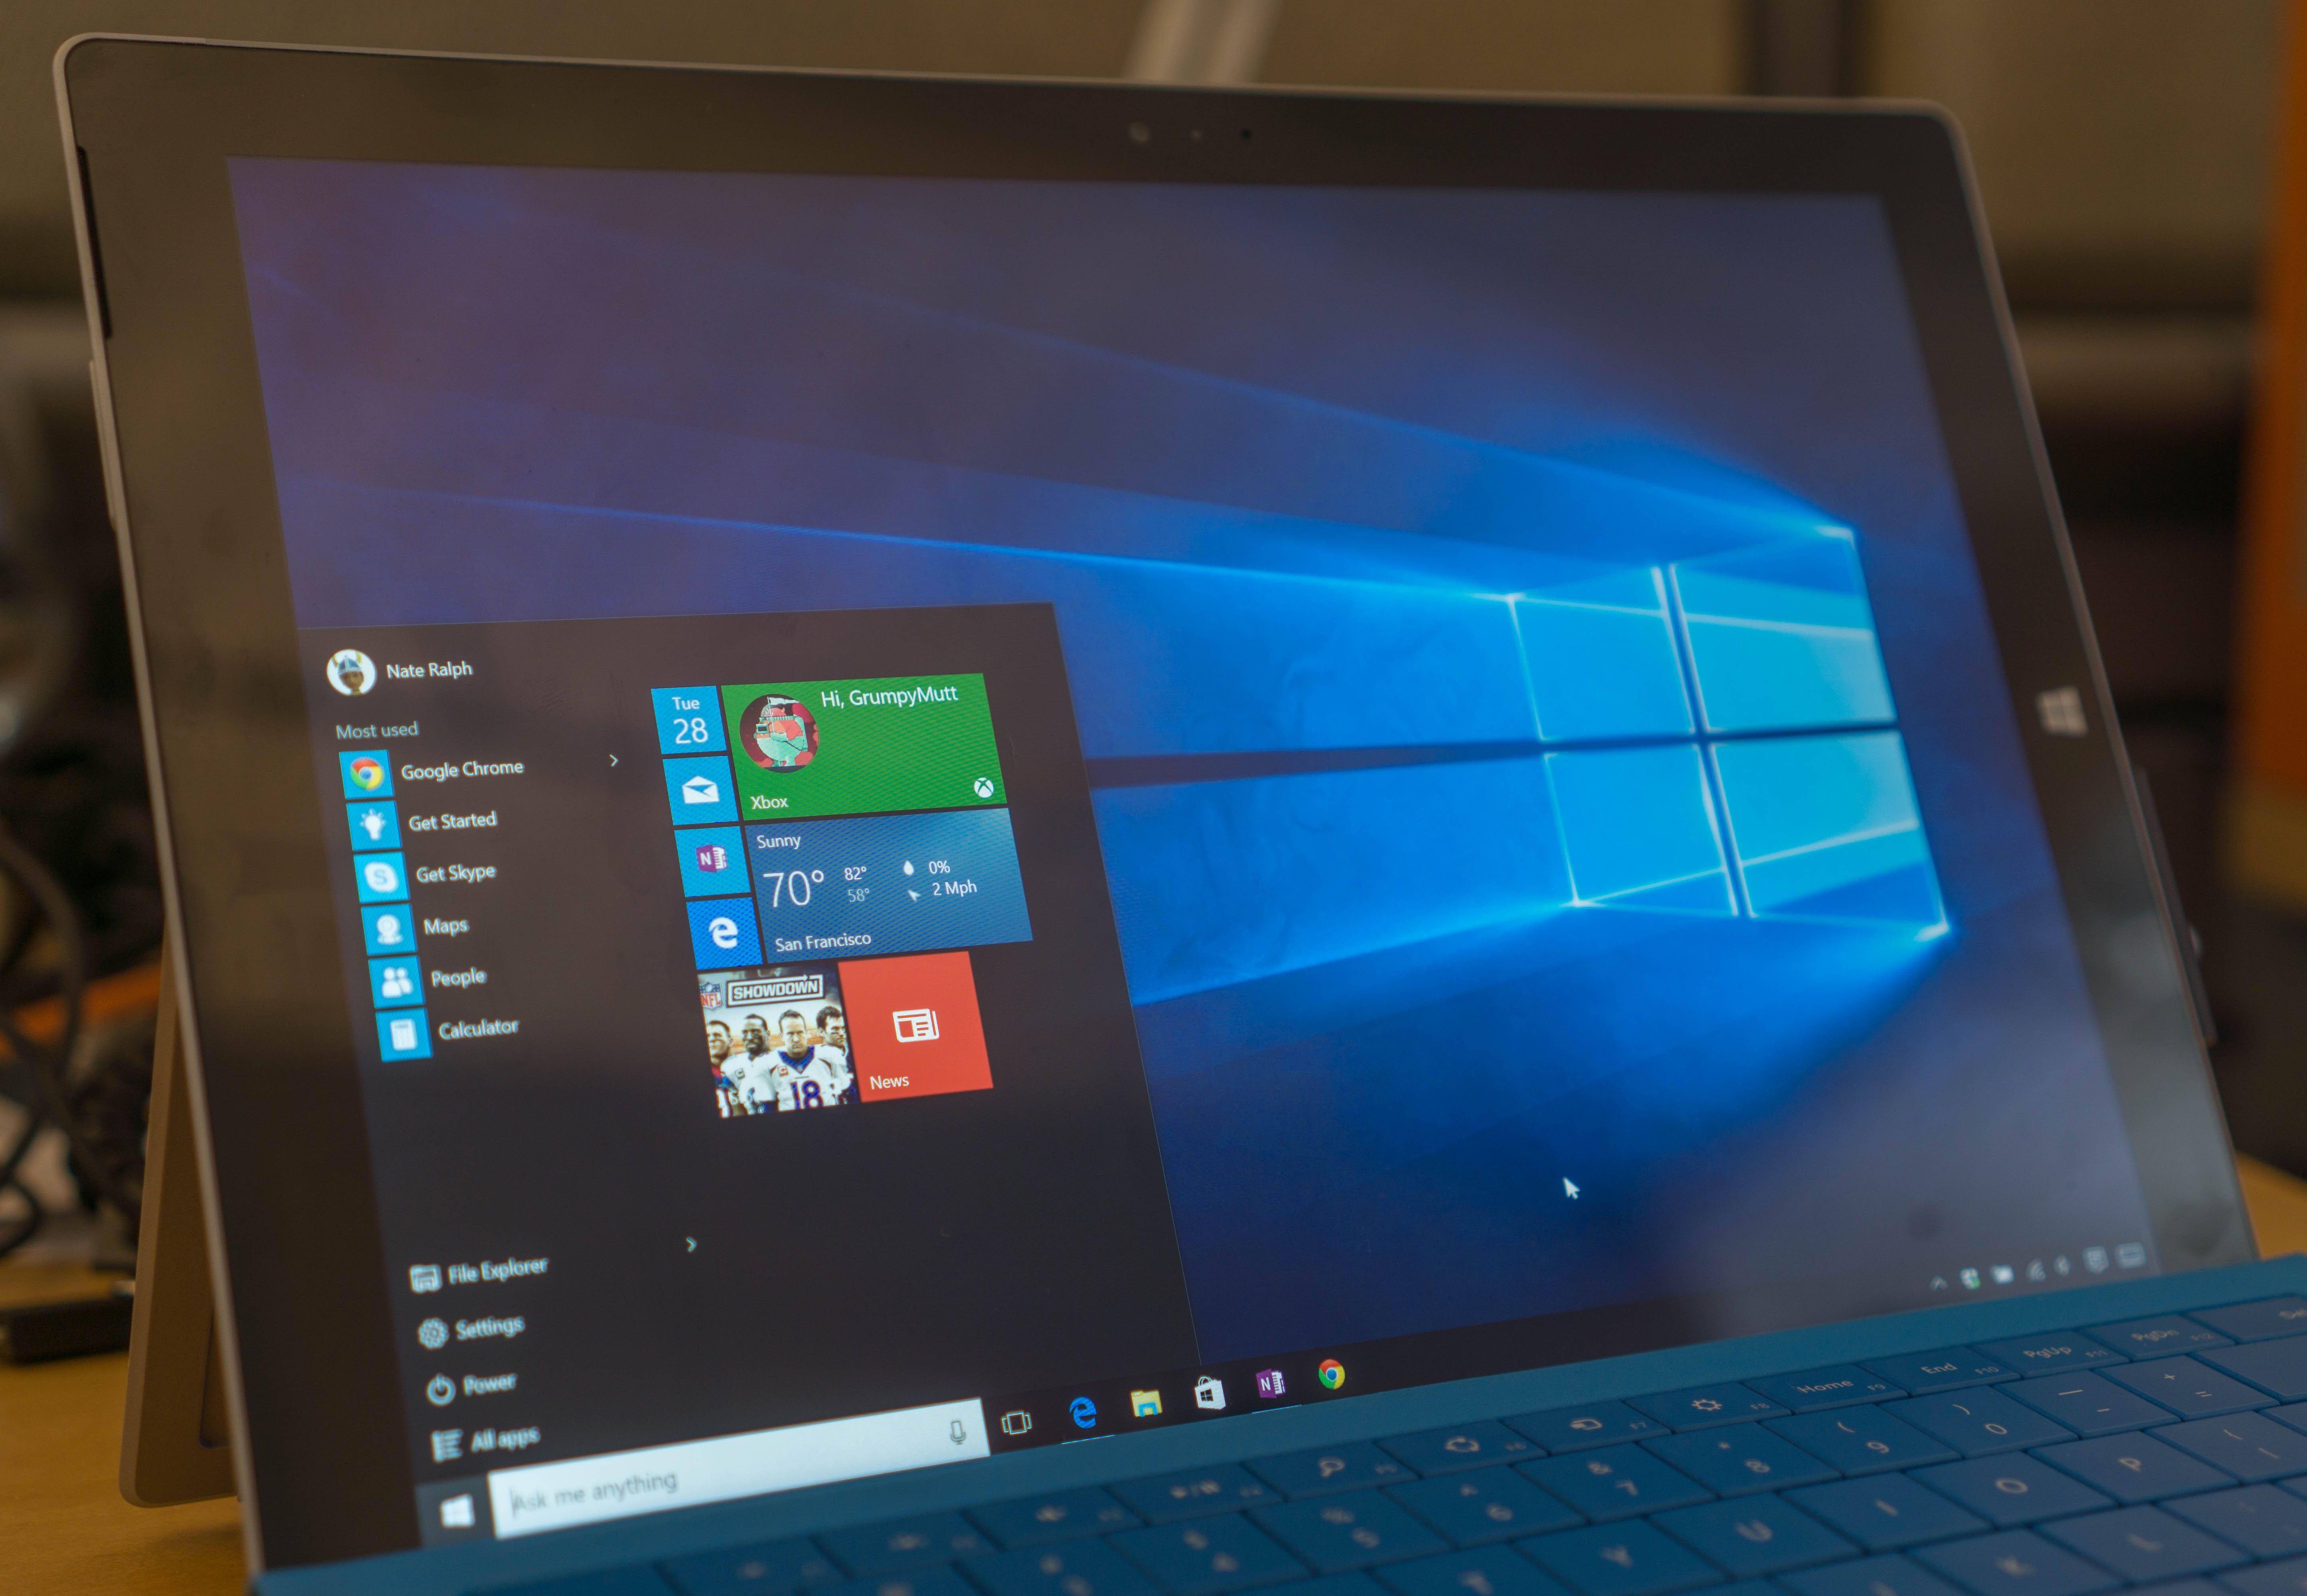 Microsoft Windows 10 Pro (With images) Windows 10